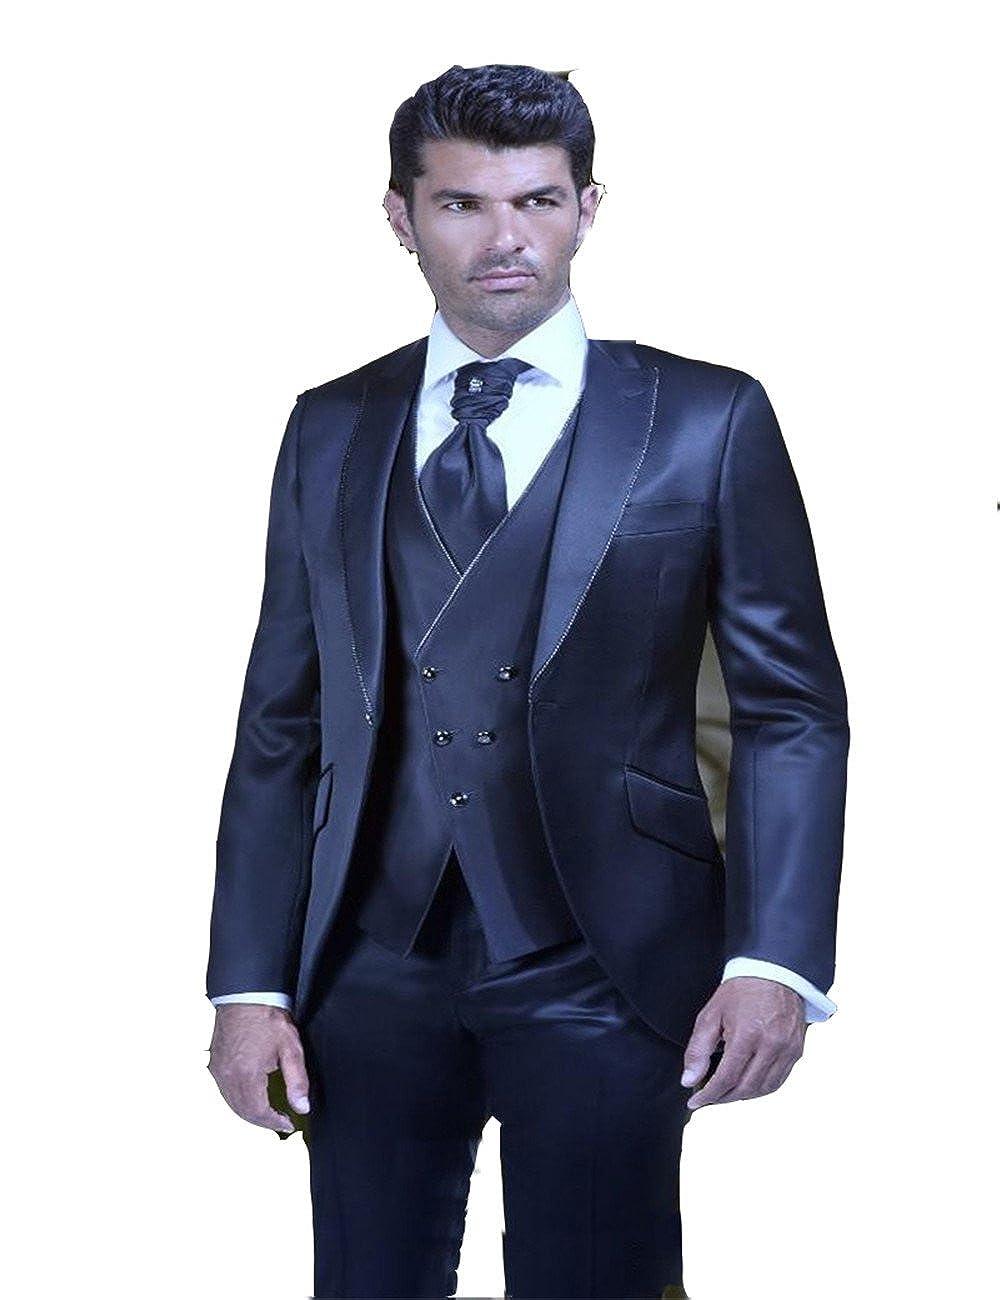 Groom Tuxedos Peak Lapel Men s Suit Navy Blue Groomsman Best Man Wedding Prom  Suits at Amazon Men s Clothing store  b0990e4fd66e